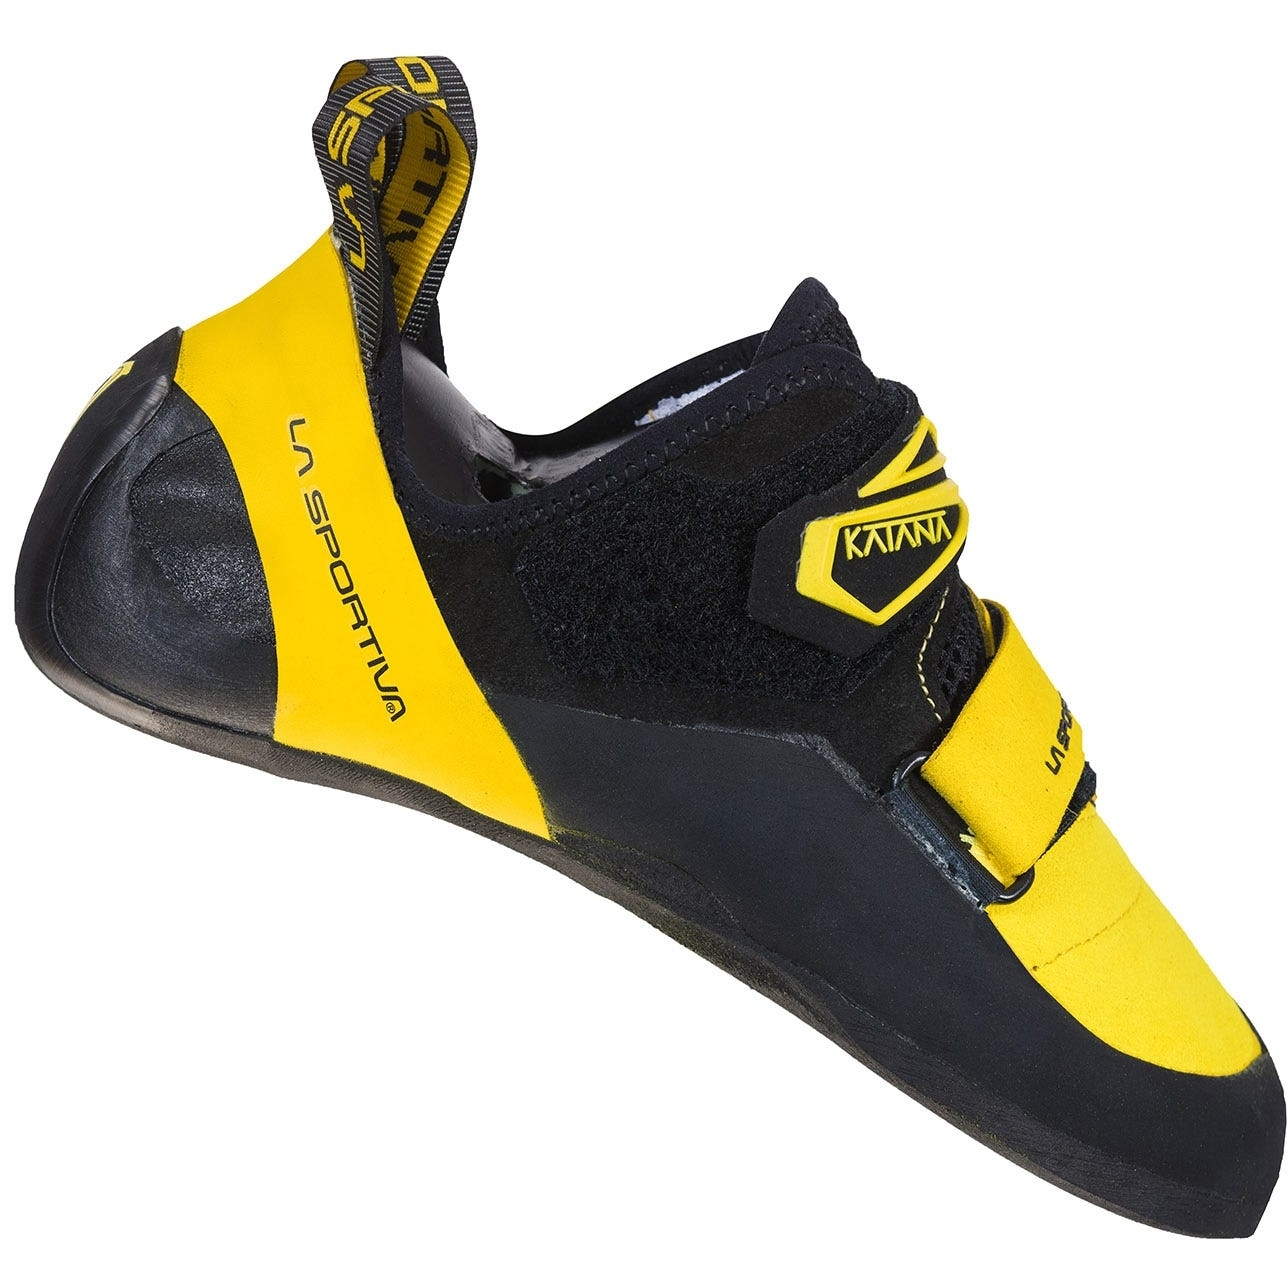 La Sportiva Katana Climbing Shoes - Yellow/Black